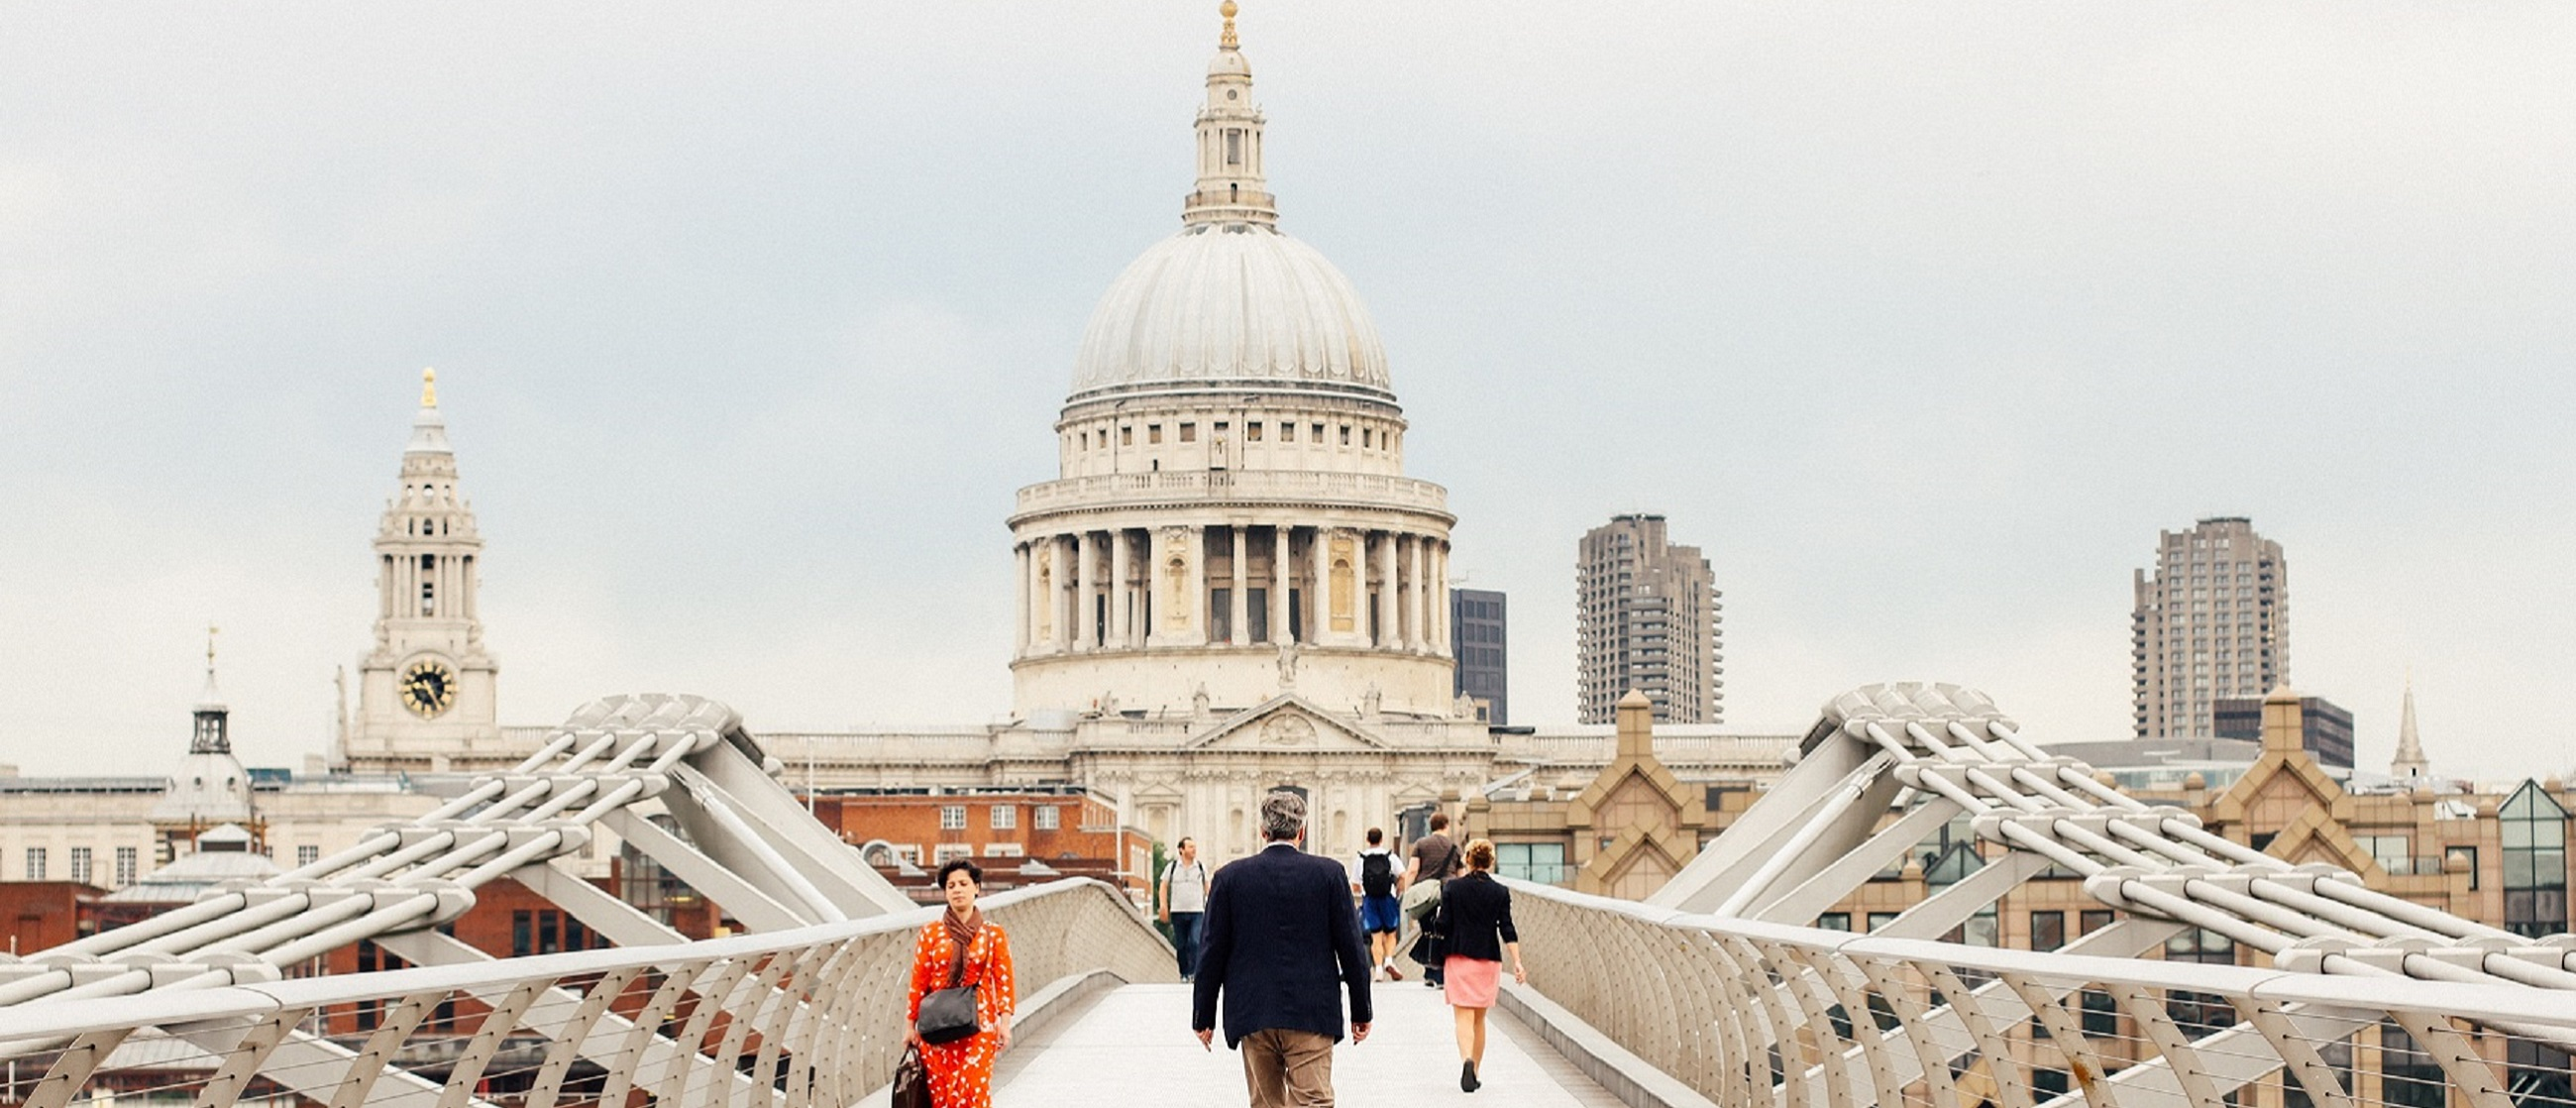 london-ways-to-save